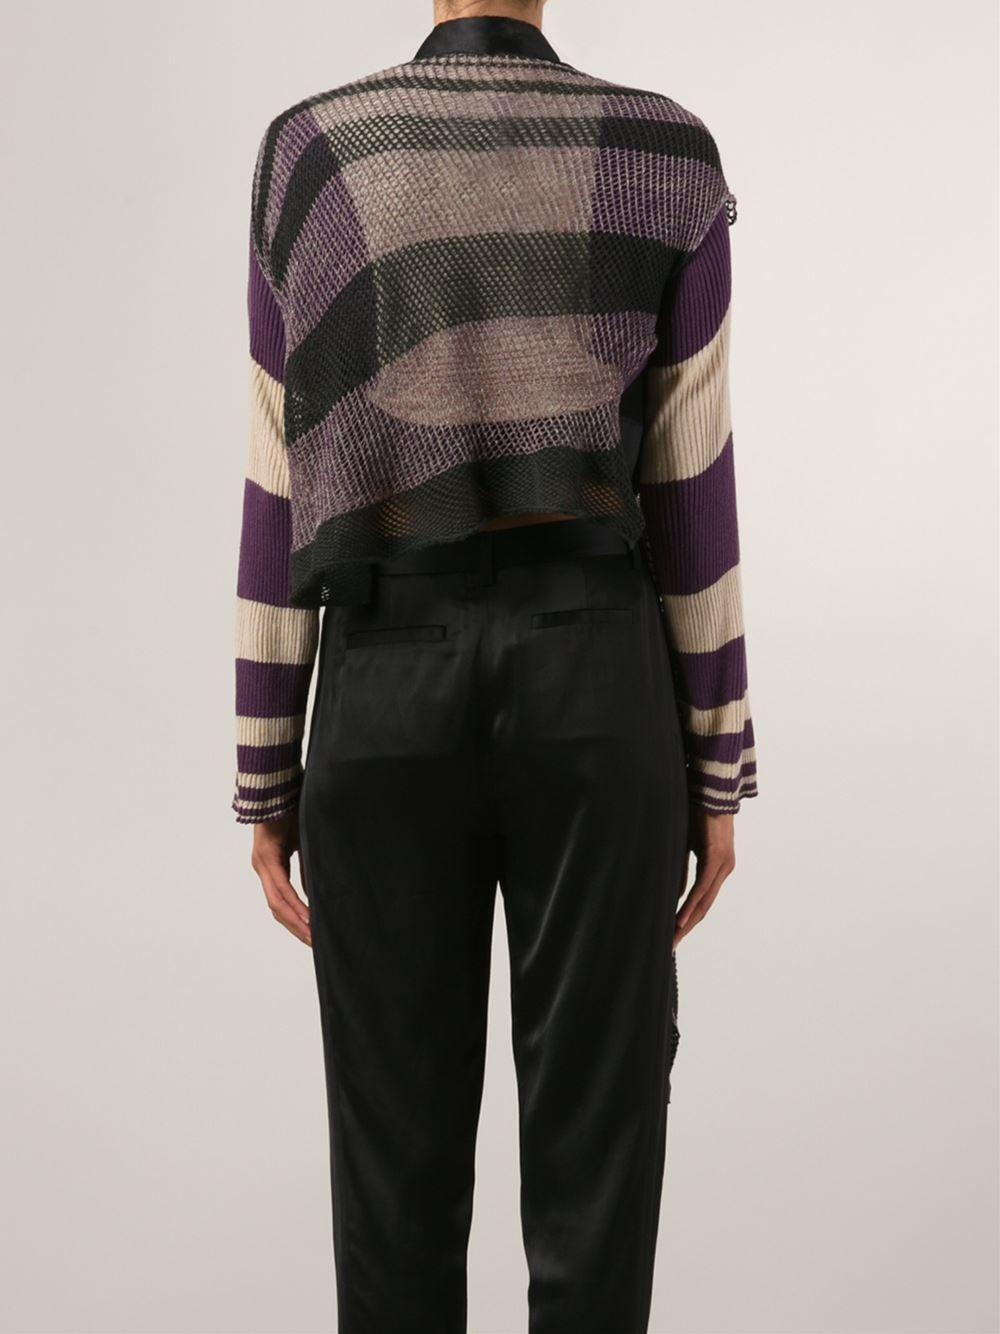 4fd4069810e85 Vivienne Westwood Drapey Striped Cardigan - Anastasia Boutique - Farfetch .com